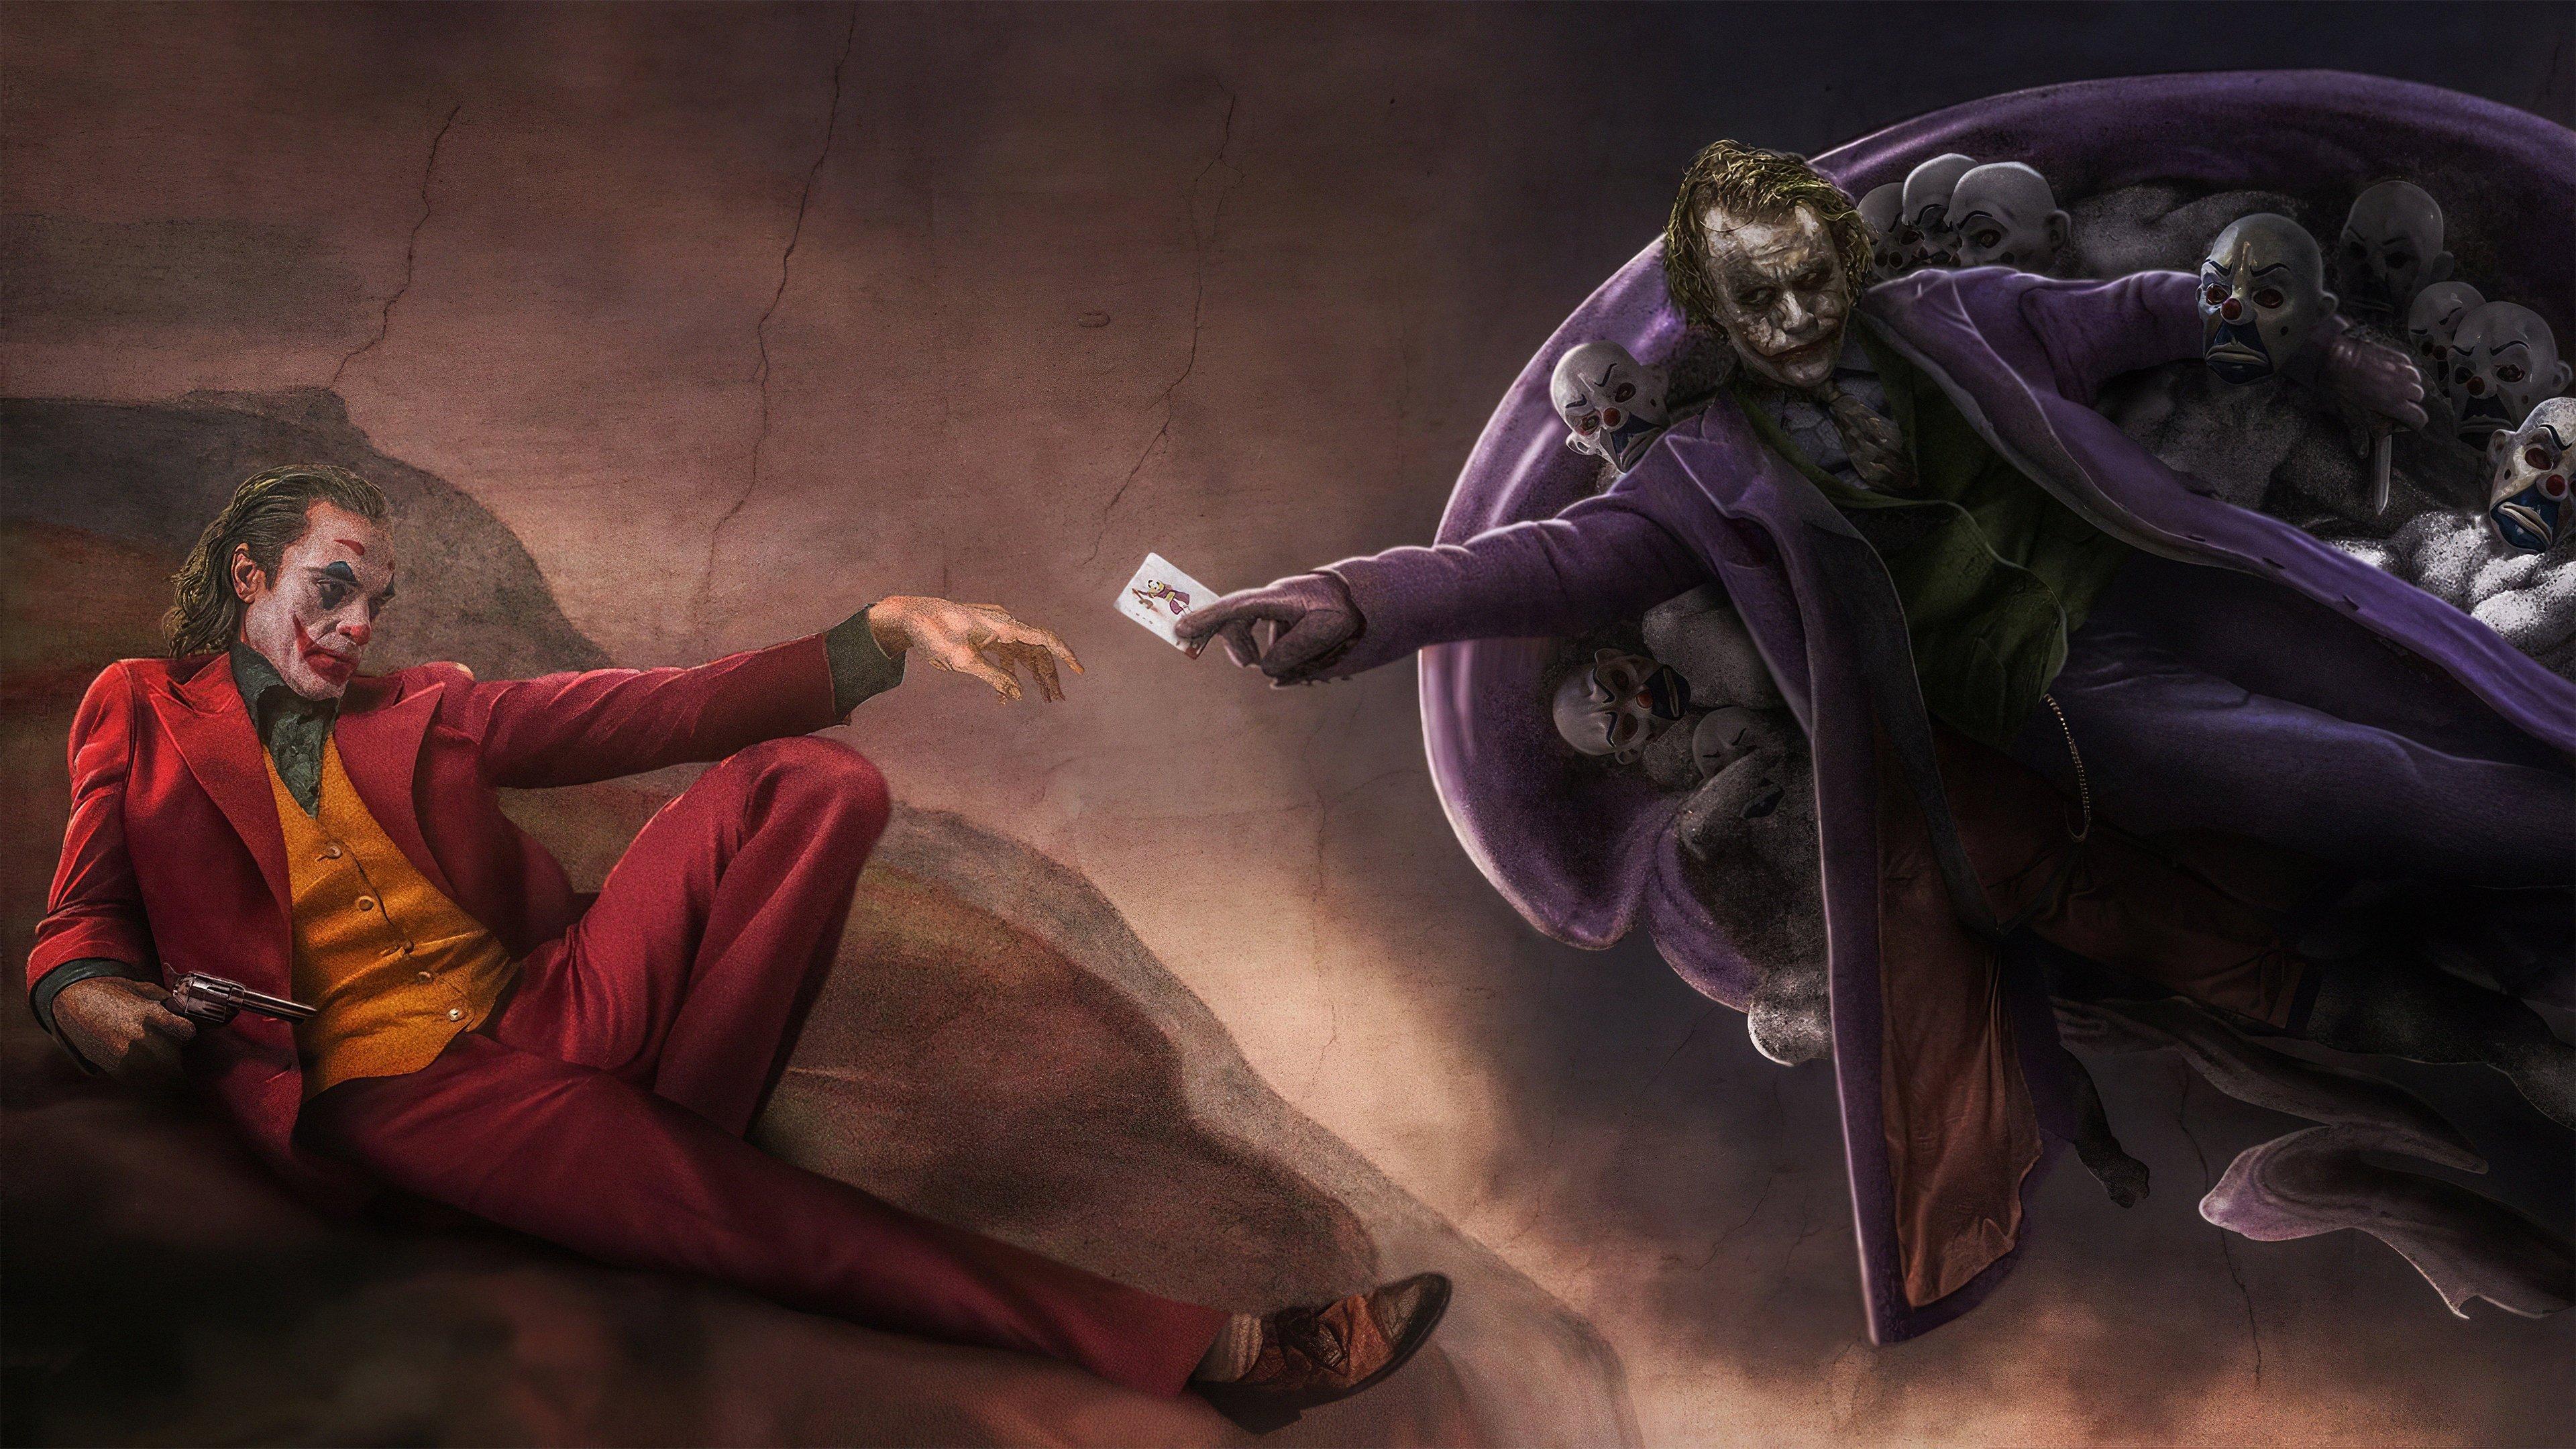 Joker As Joaquin Phoenix And Heath Ledger In Michelangelo